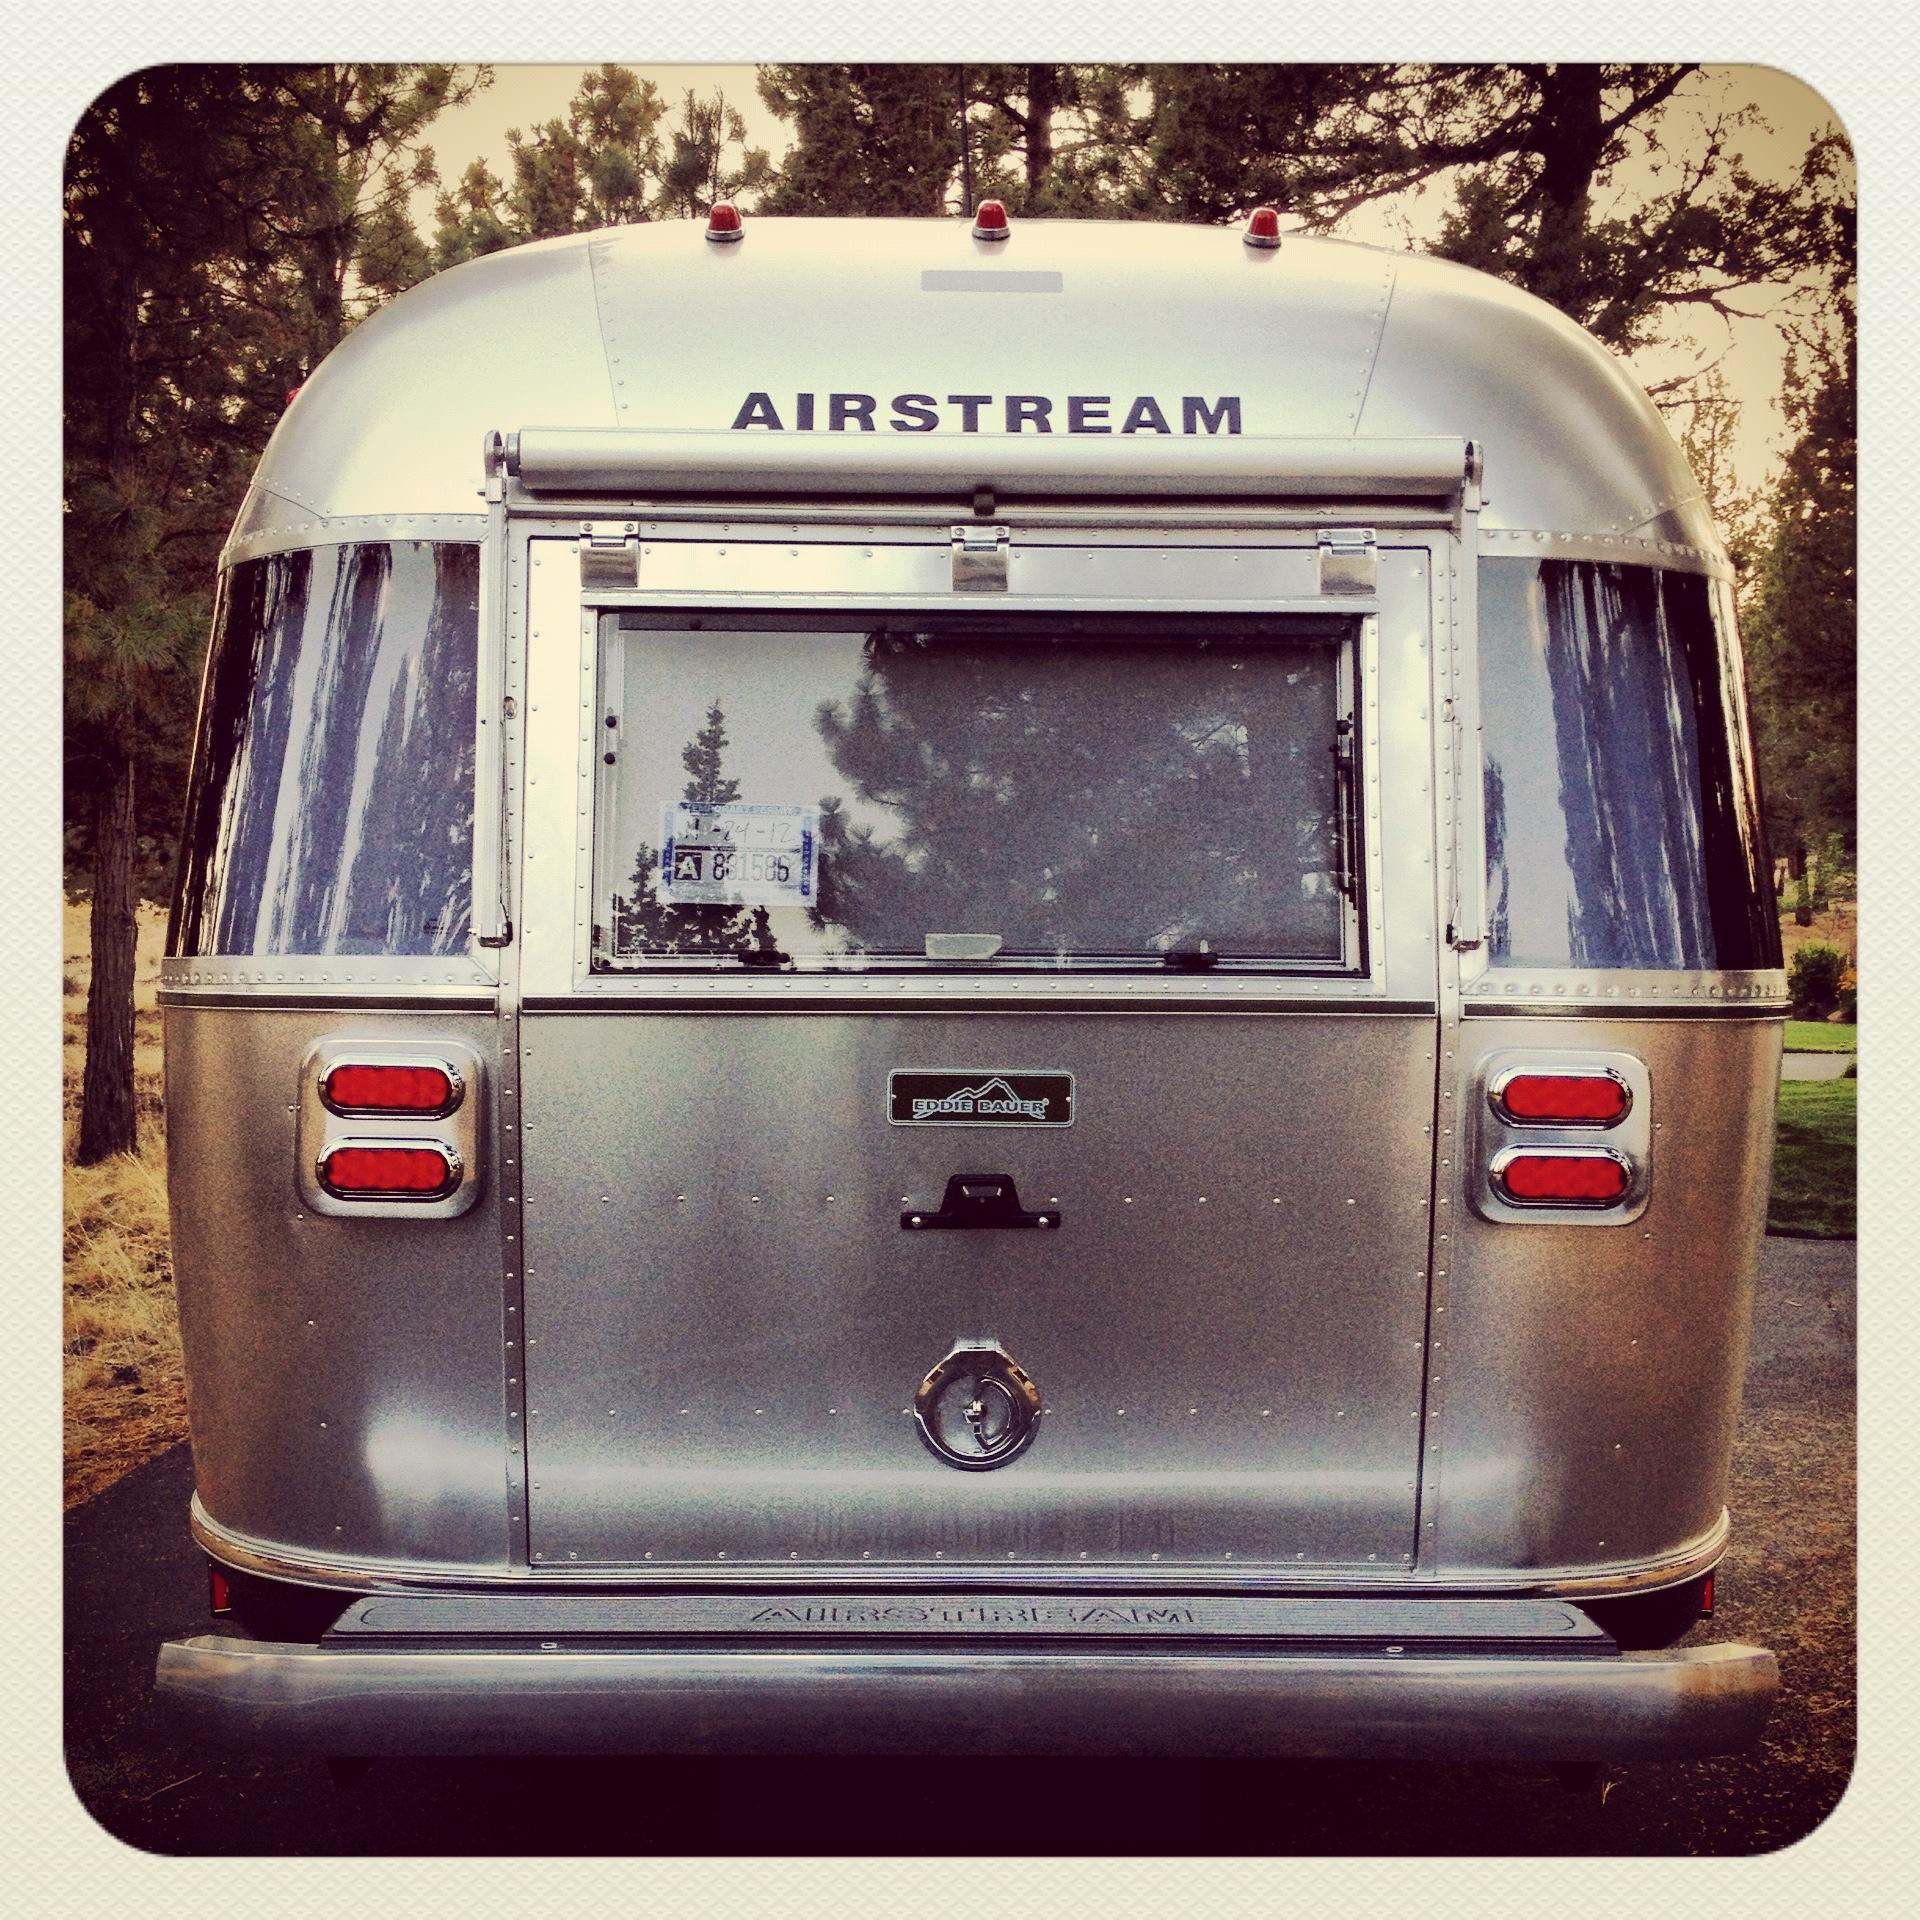 Airstream Love